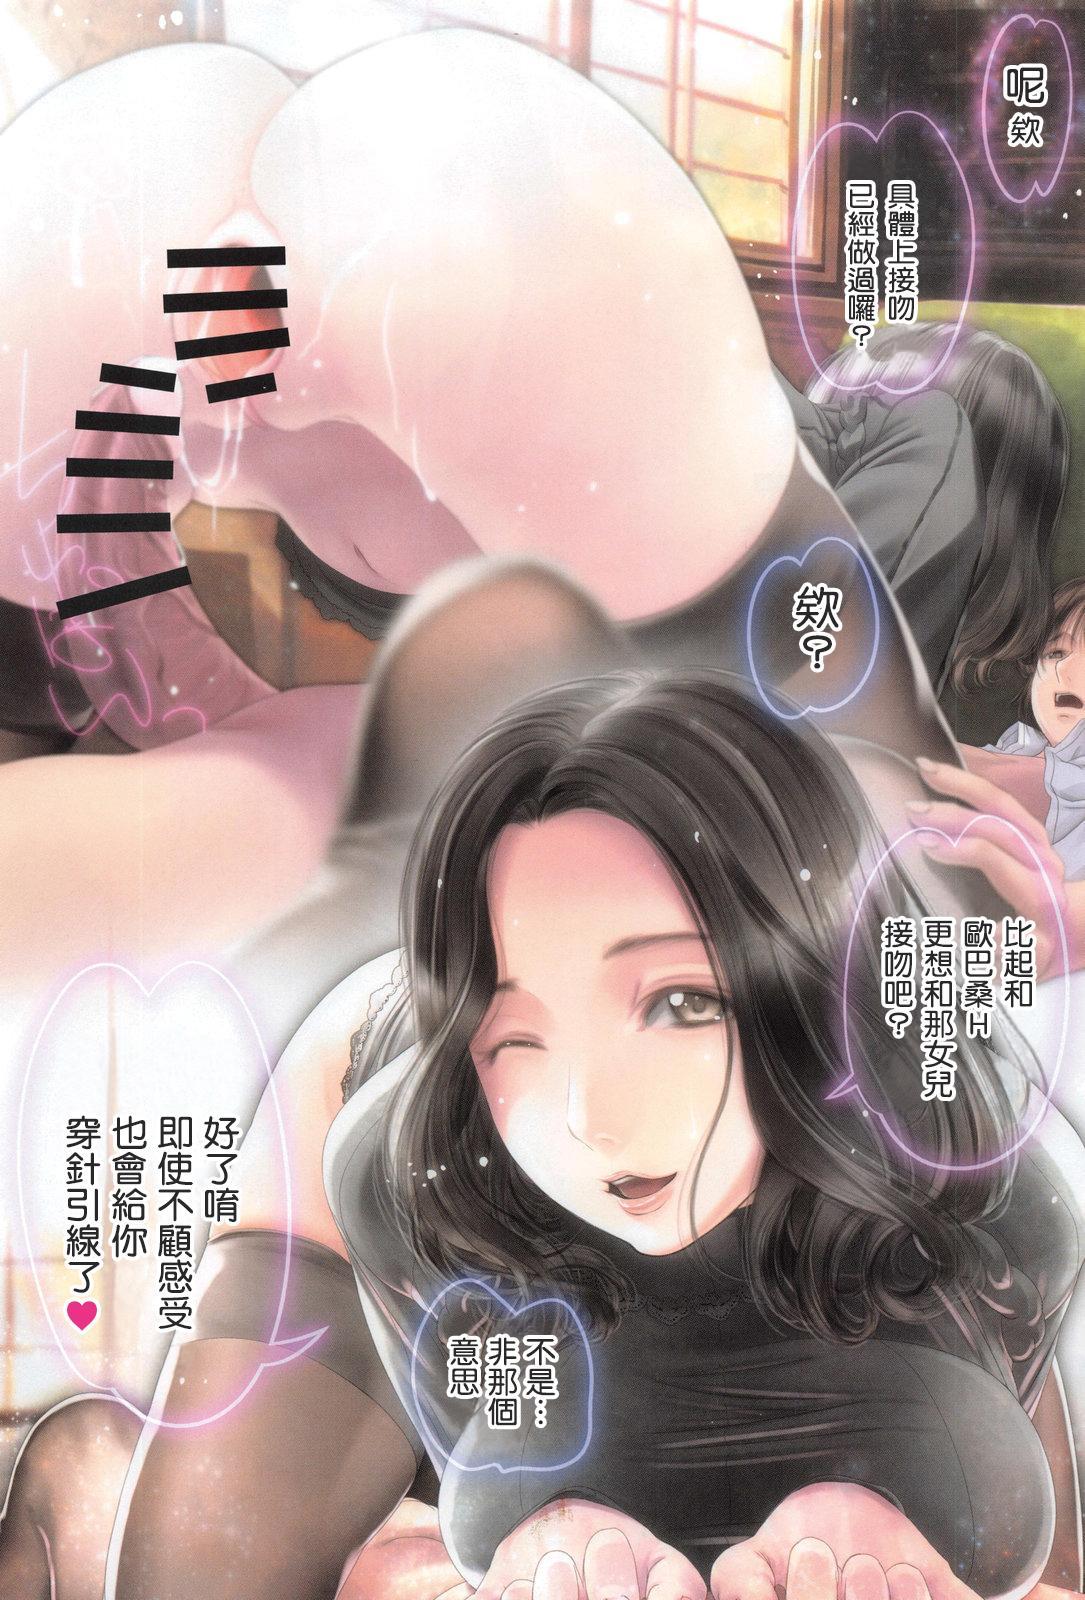 Shirayuki Hime no Okaa-san 3